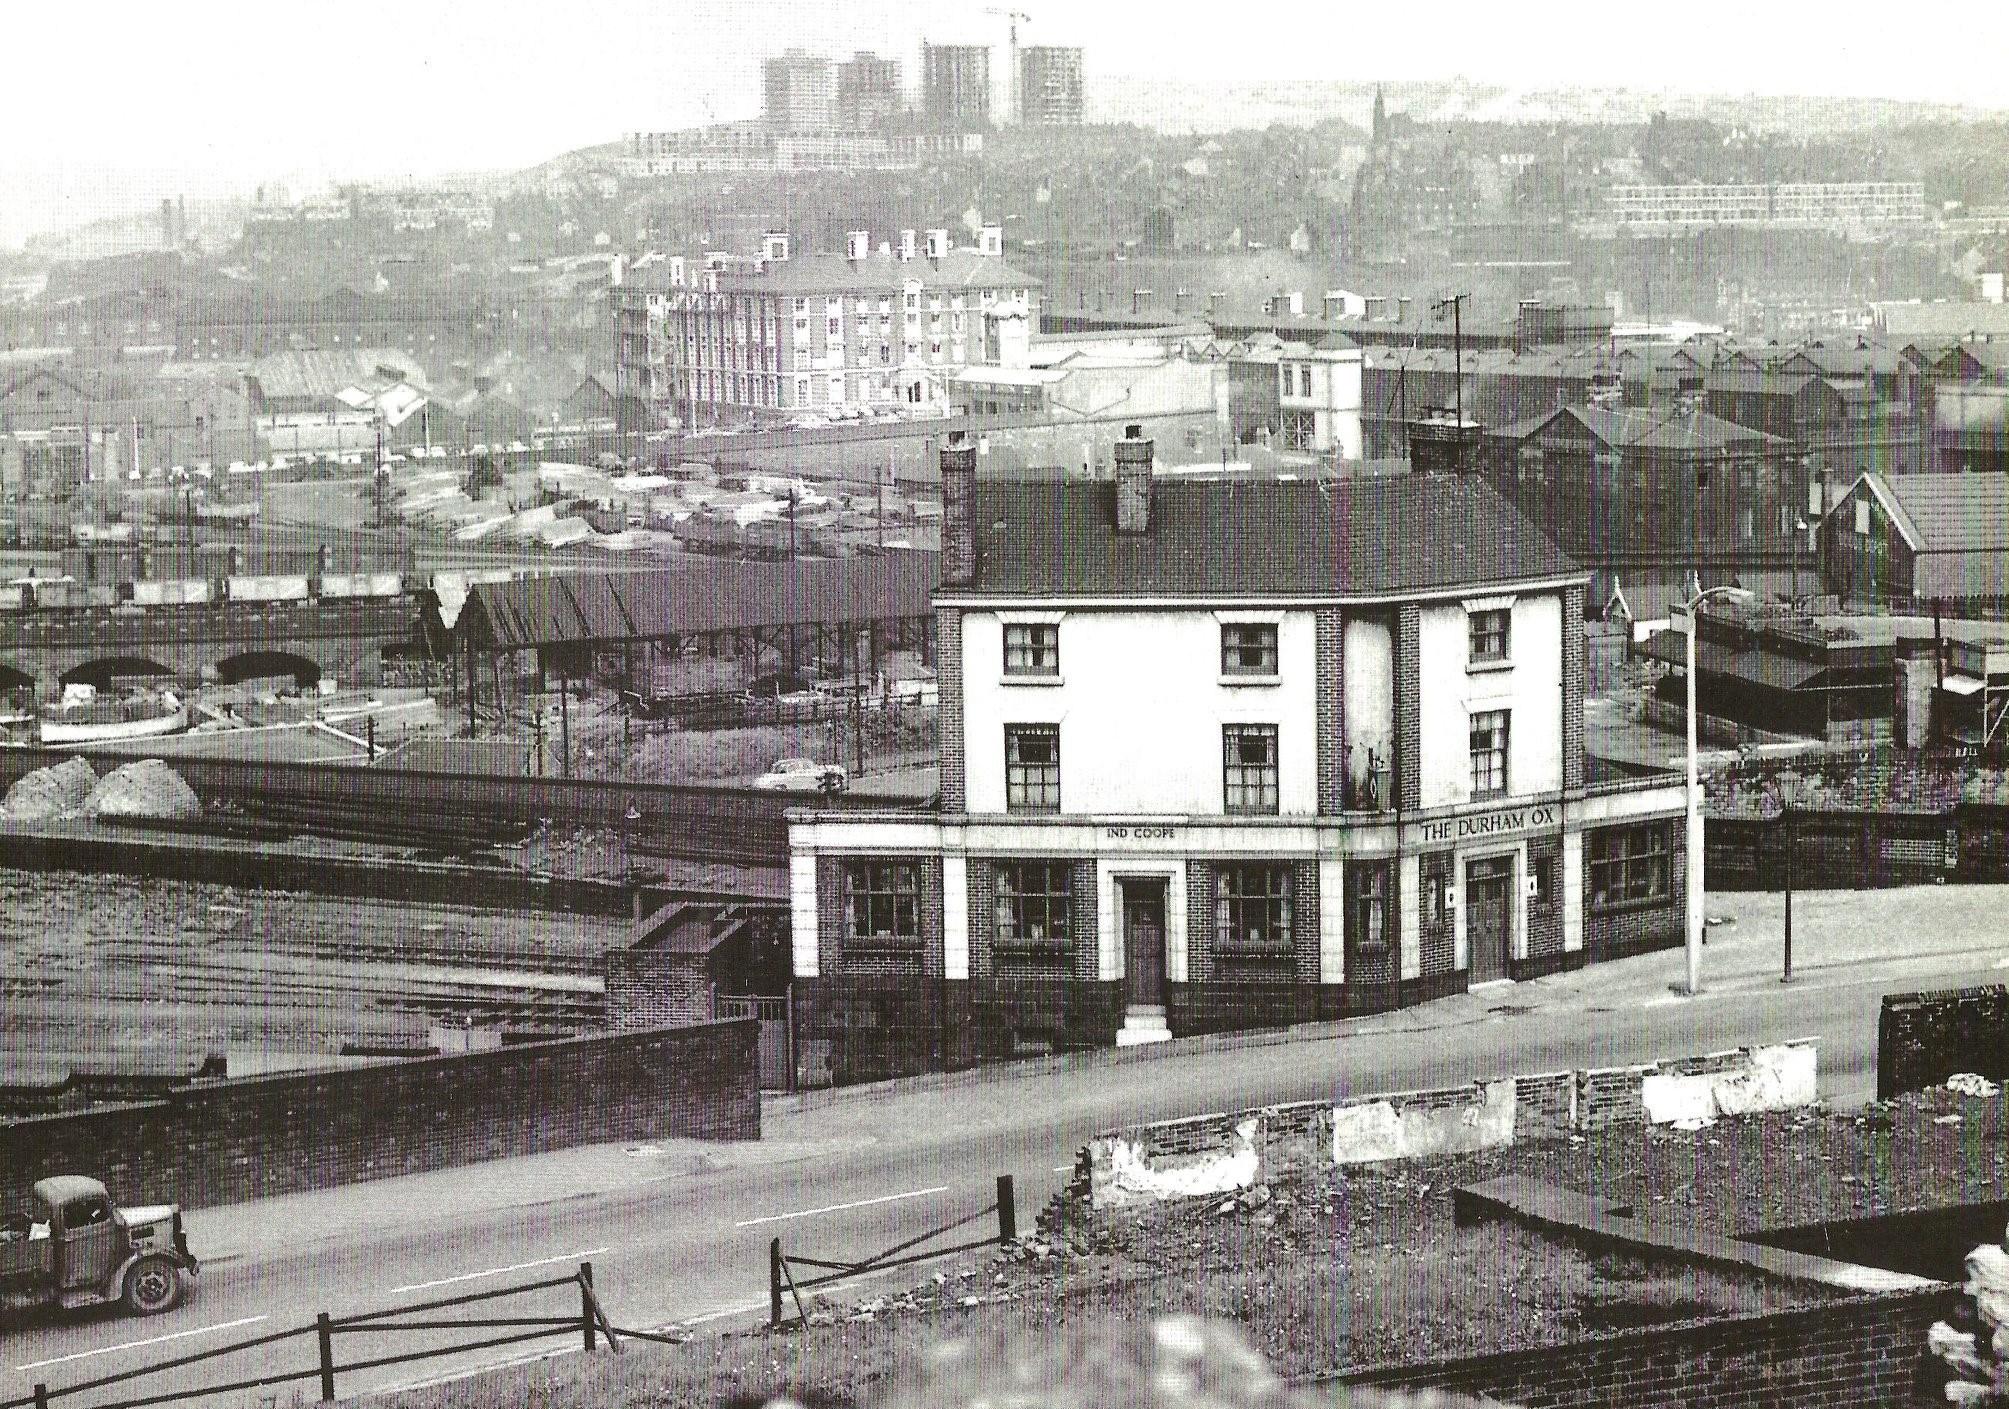 The Durham Ox on Cricket Inn Road